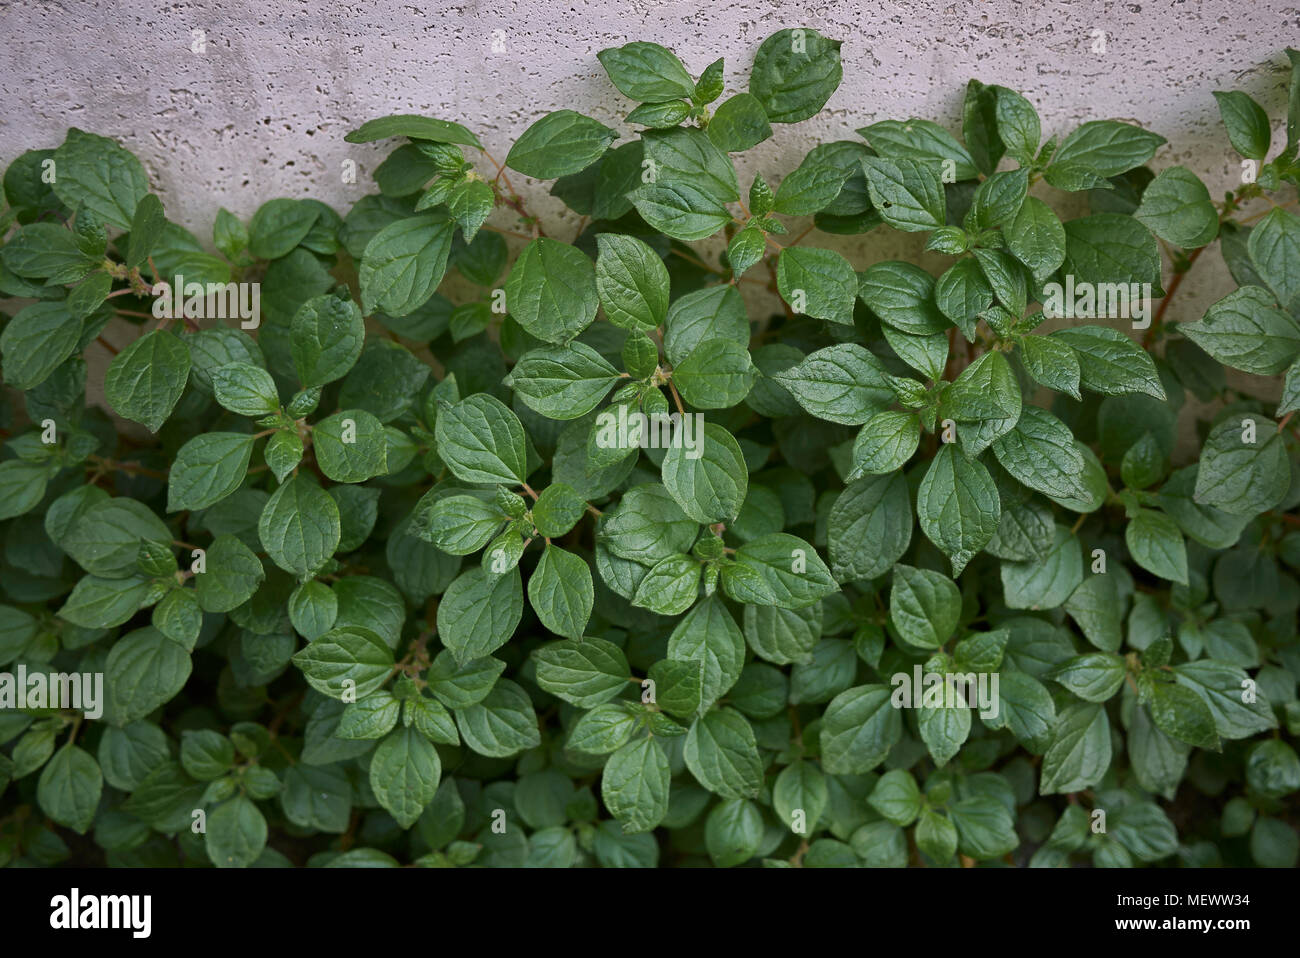 Parietaria Officinalis Plants Stock Photo 181277352 Alamy